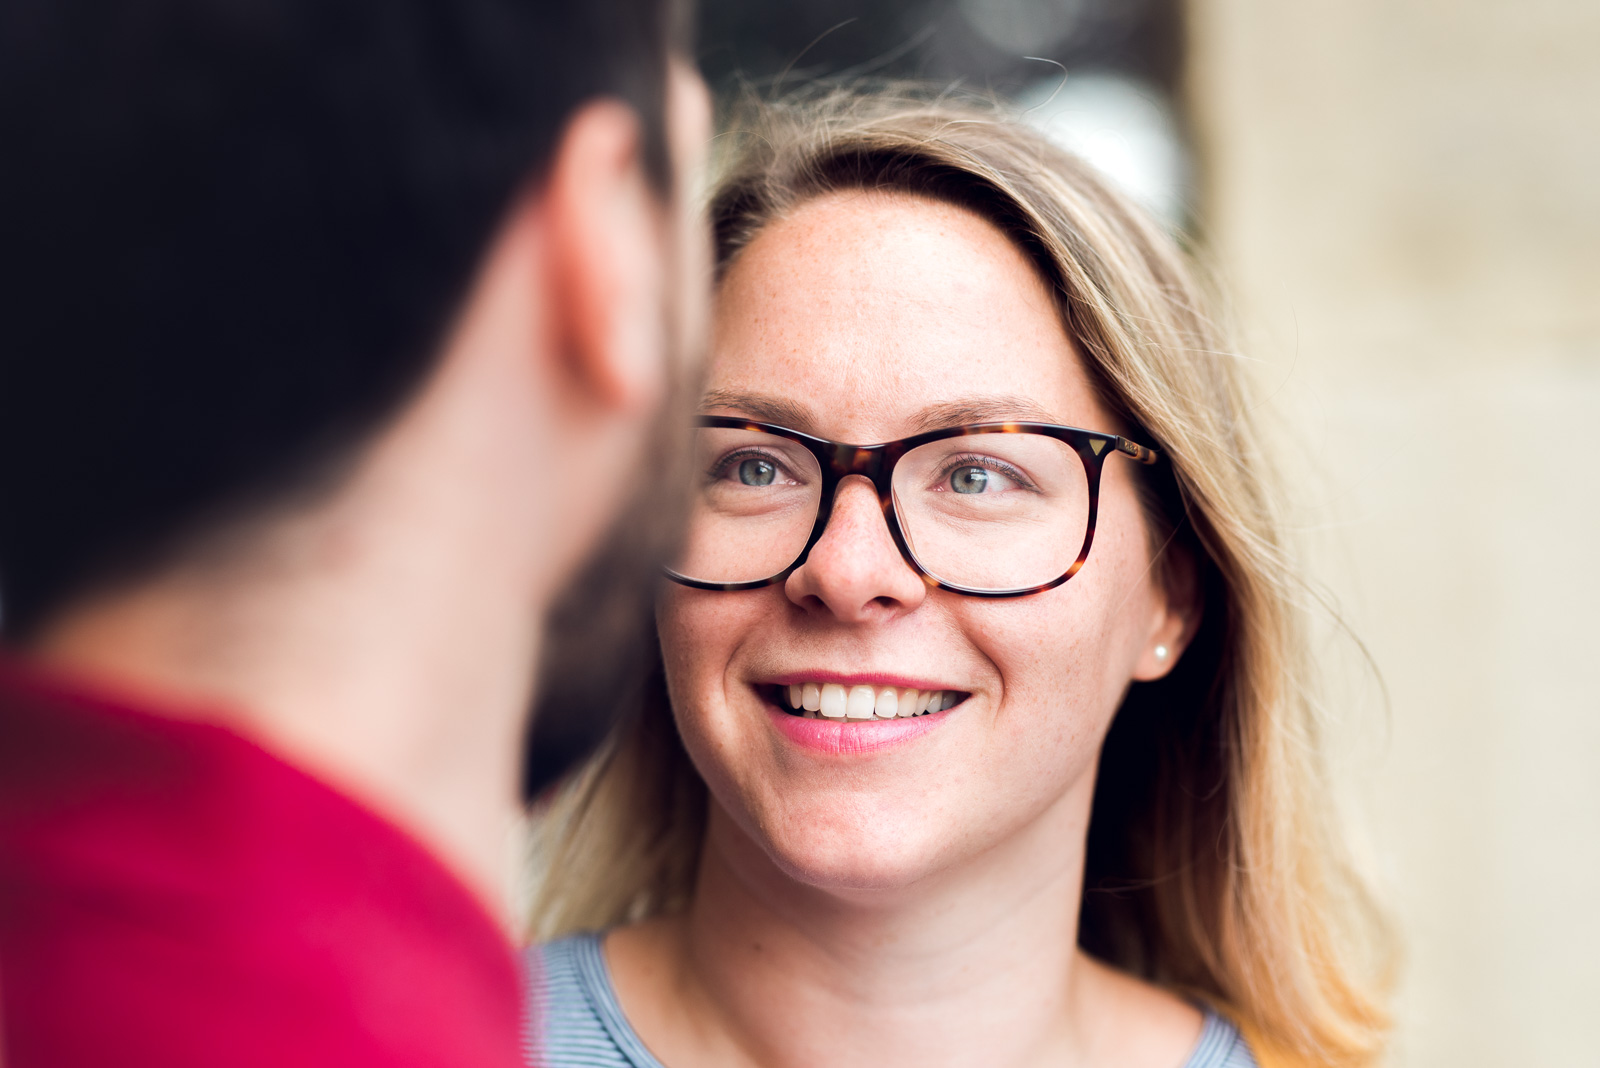 Couple making eye contact smiling - Cotswolds Wedding Photographer